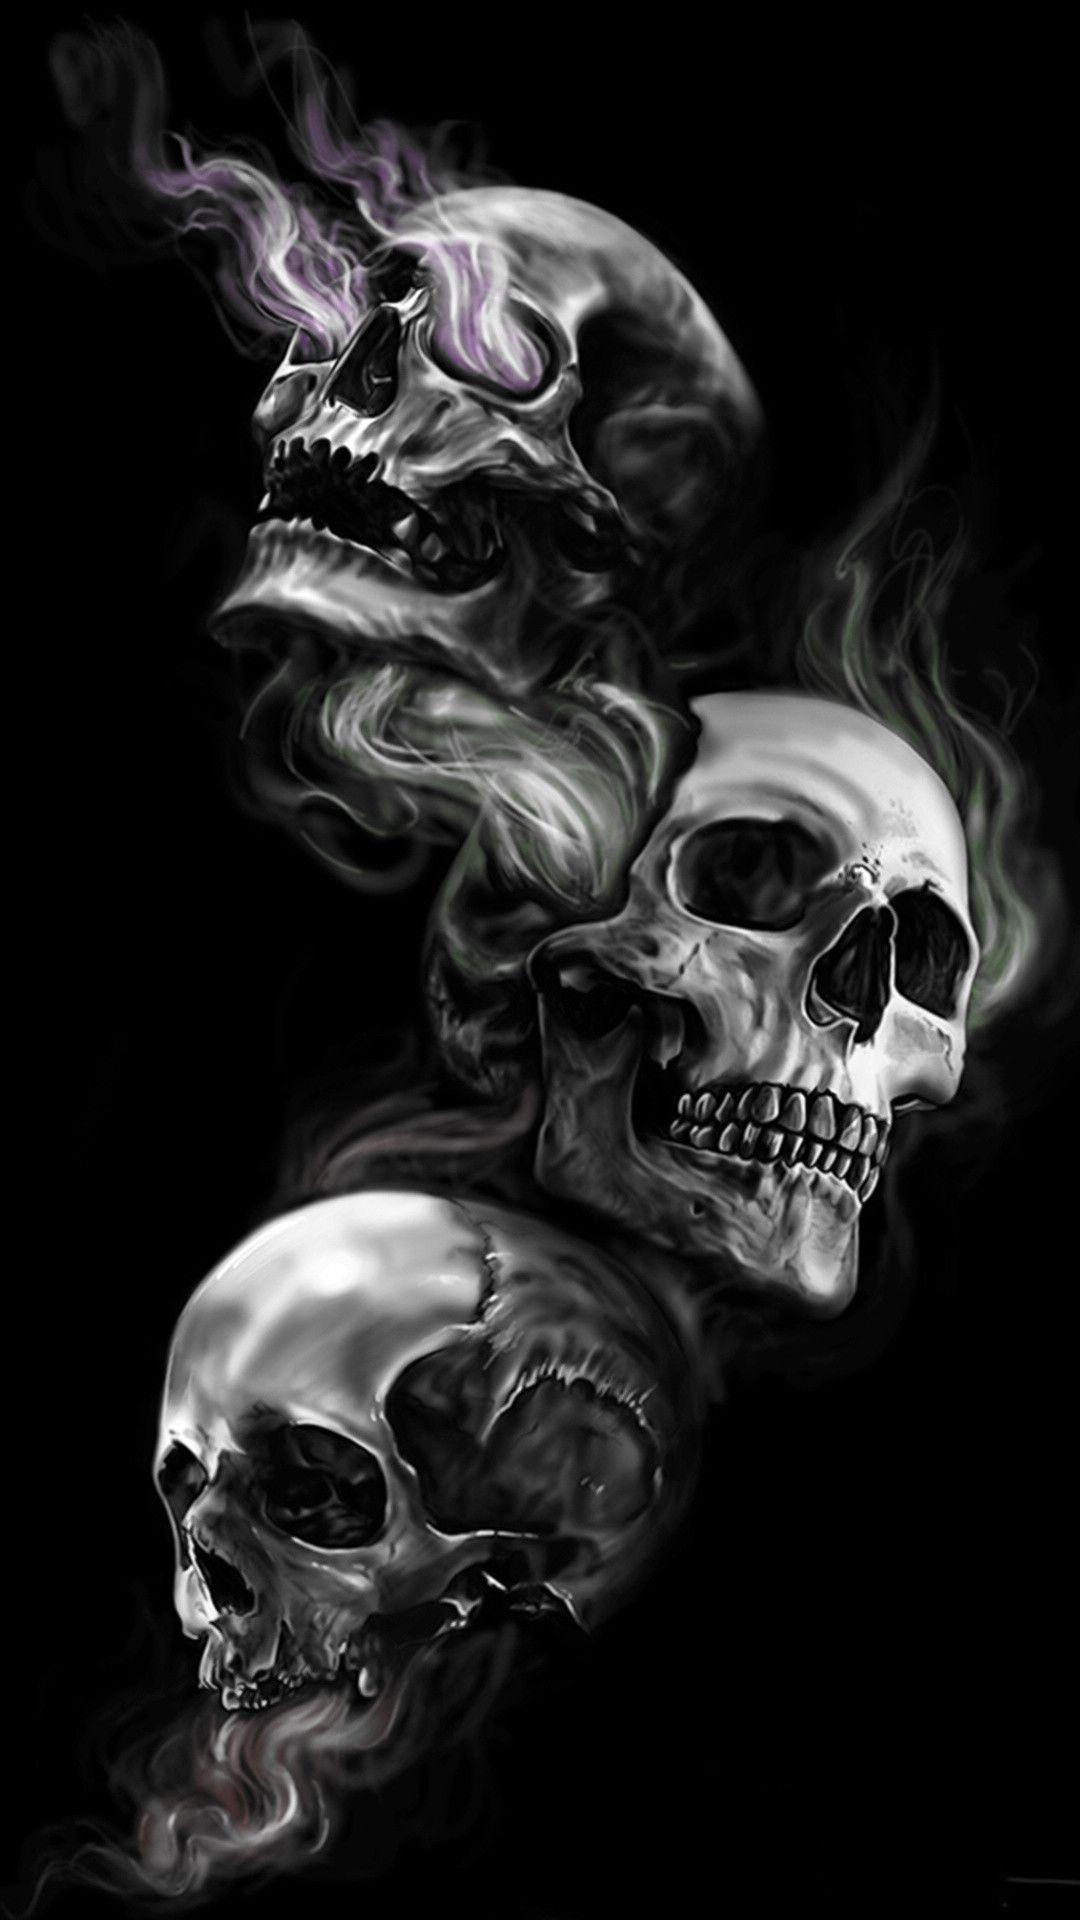 Skull Phone Wallpapers - Top Free Skull